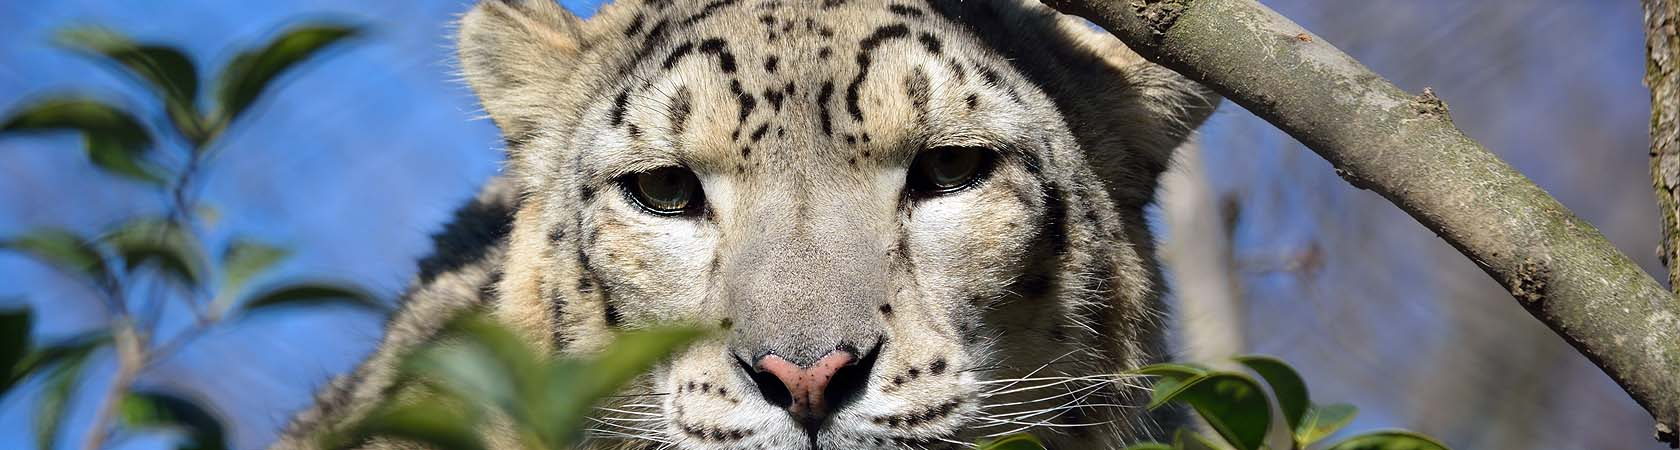 show-leopard-trust-parco-faunistico-le-cornelle-leonardodelfini05